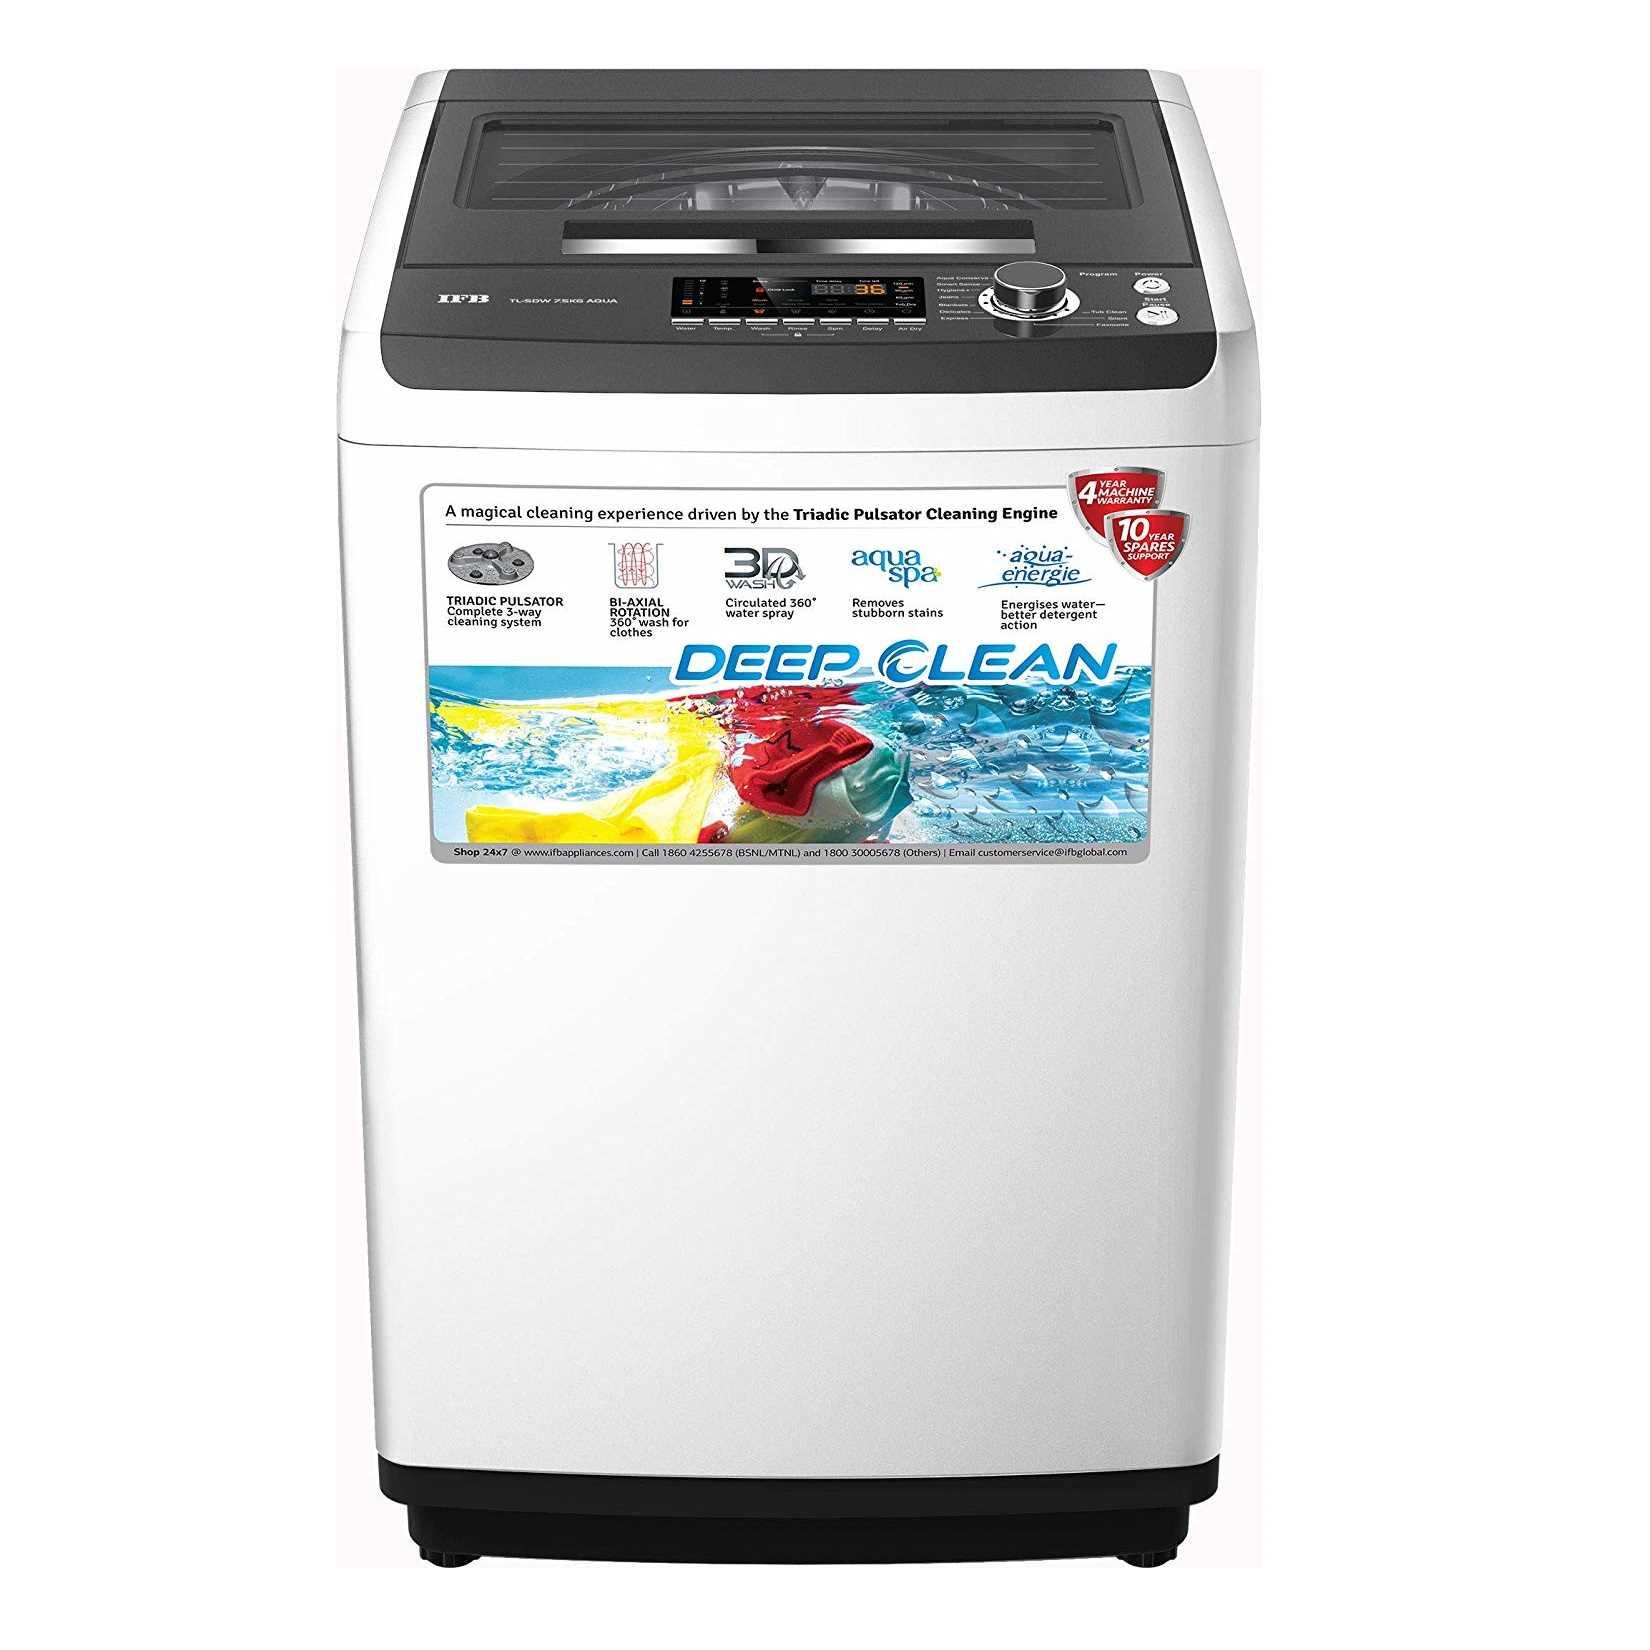 IFB TL-SDW Aqua 7.5 Kg Fully Automatic Top Loading Washing Machine